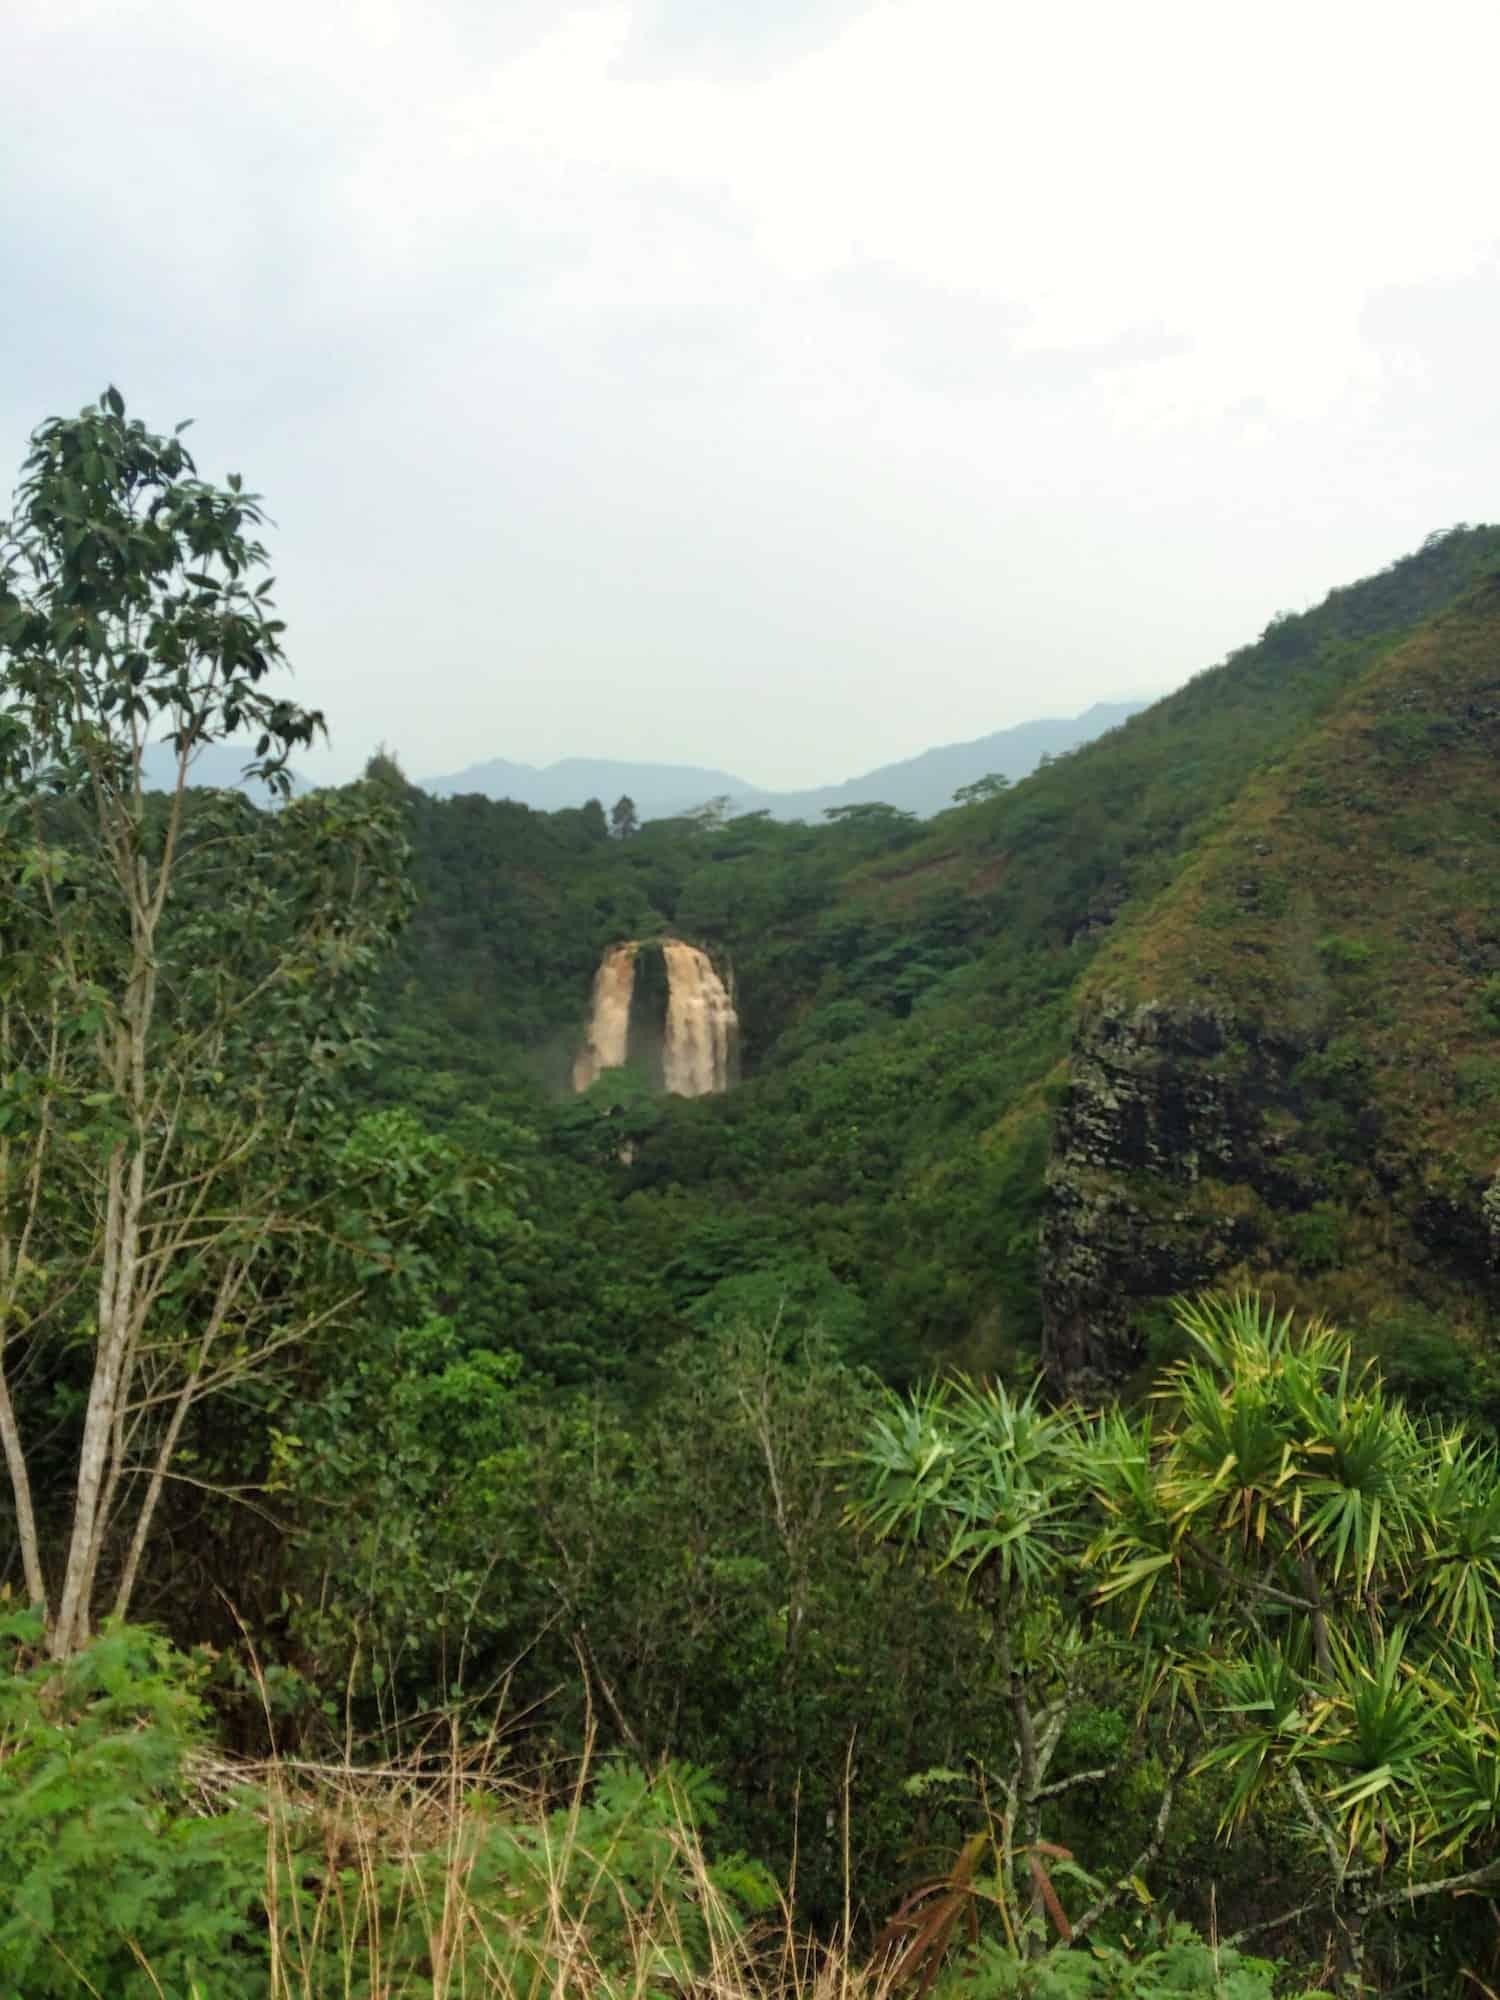 3 Days in Kauai - Opaeka'a Falls